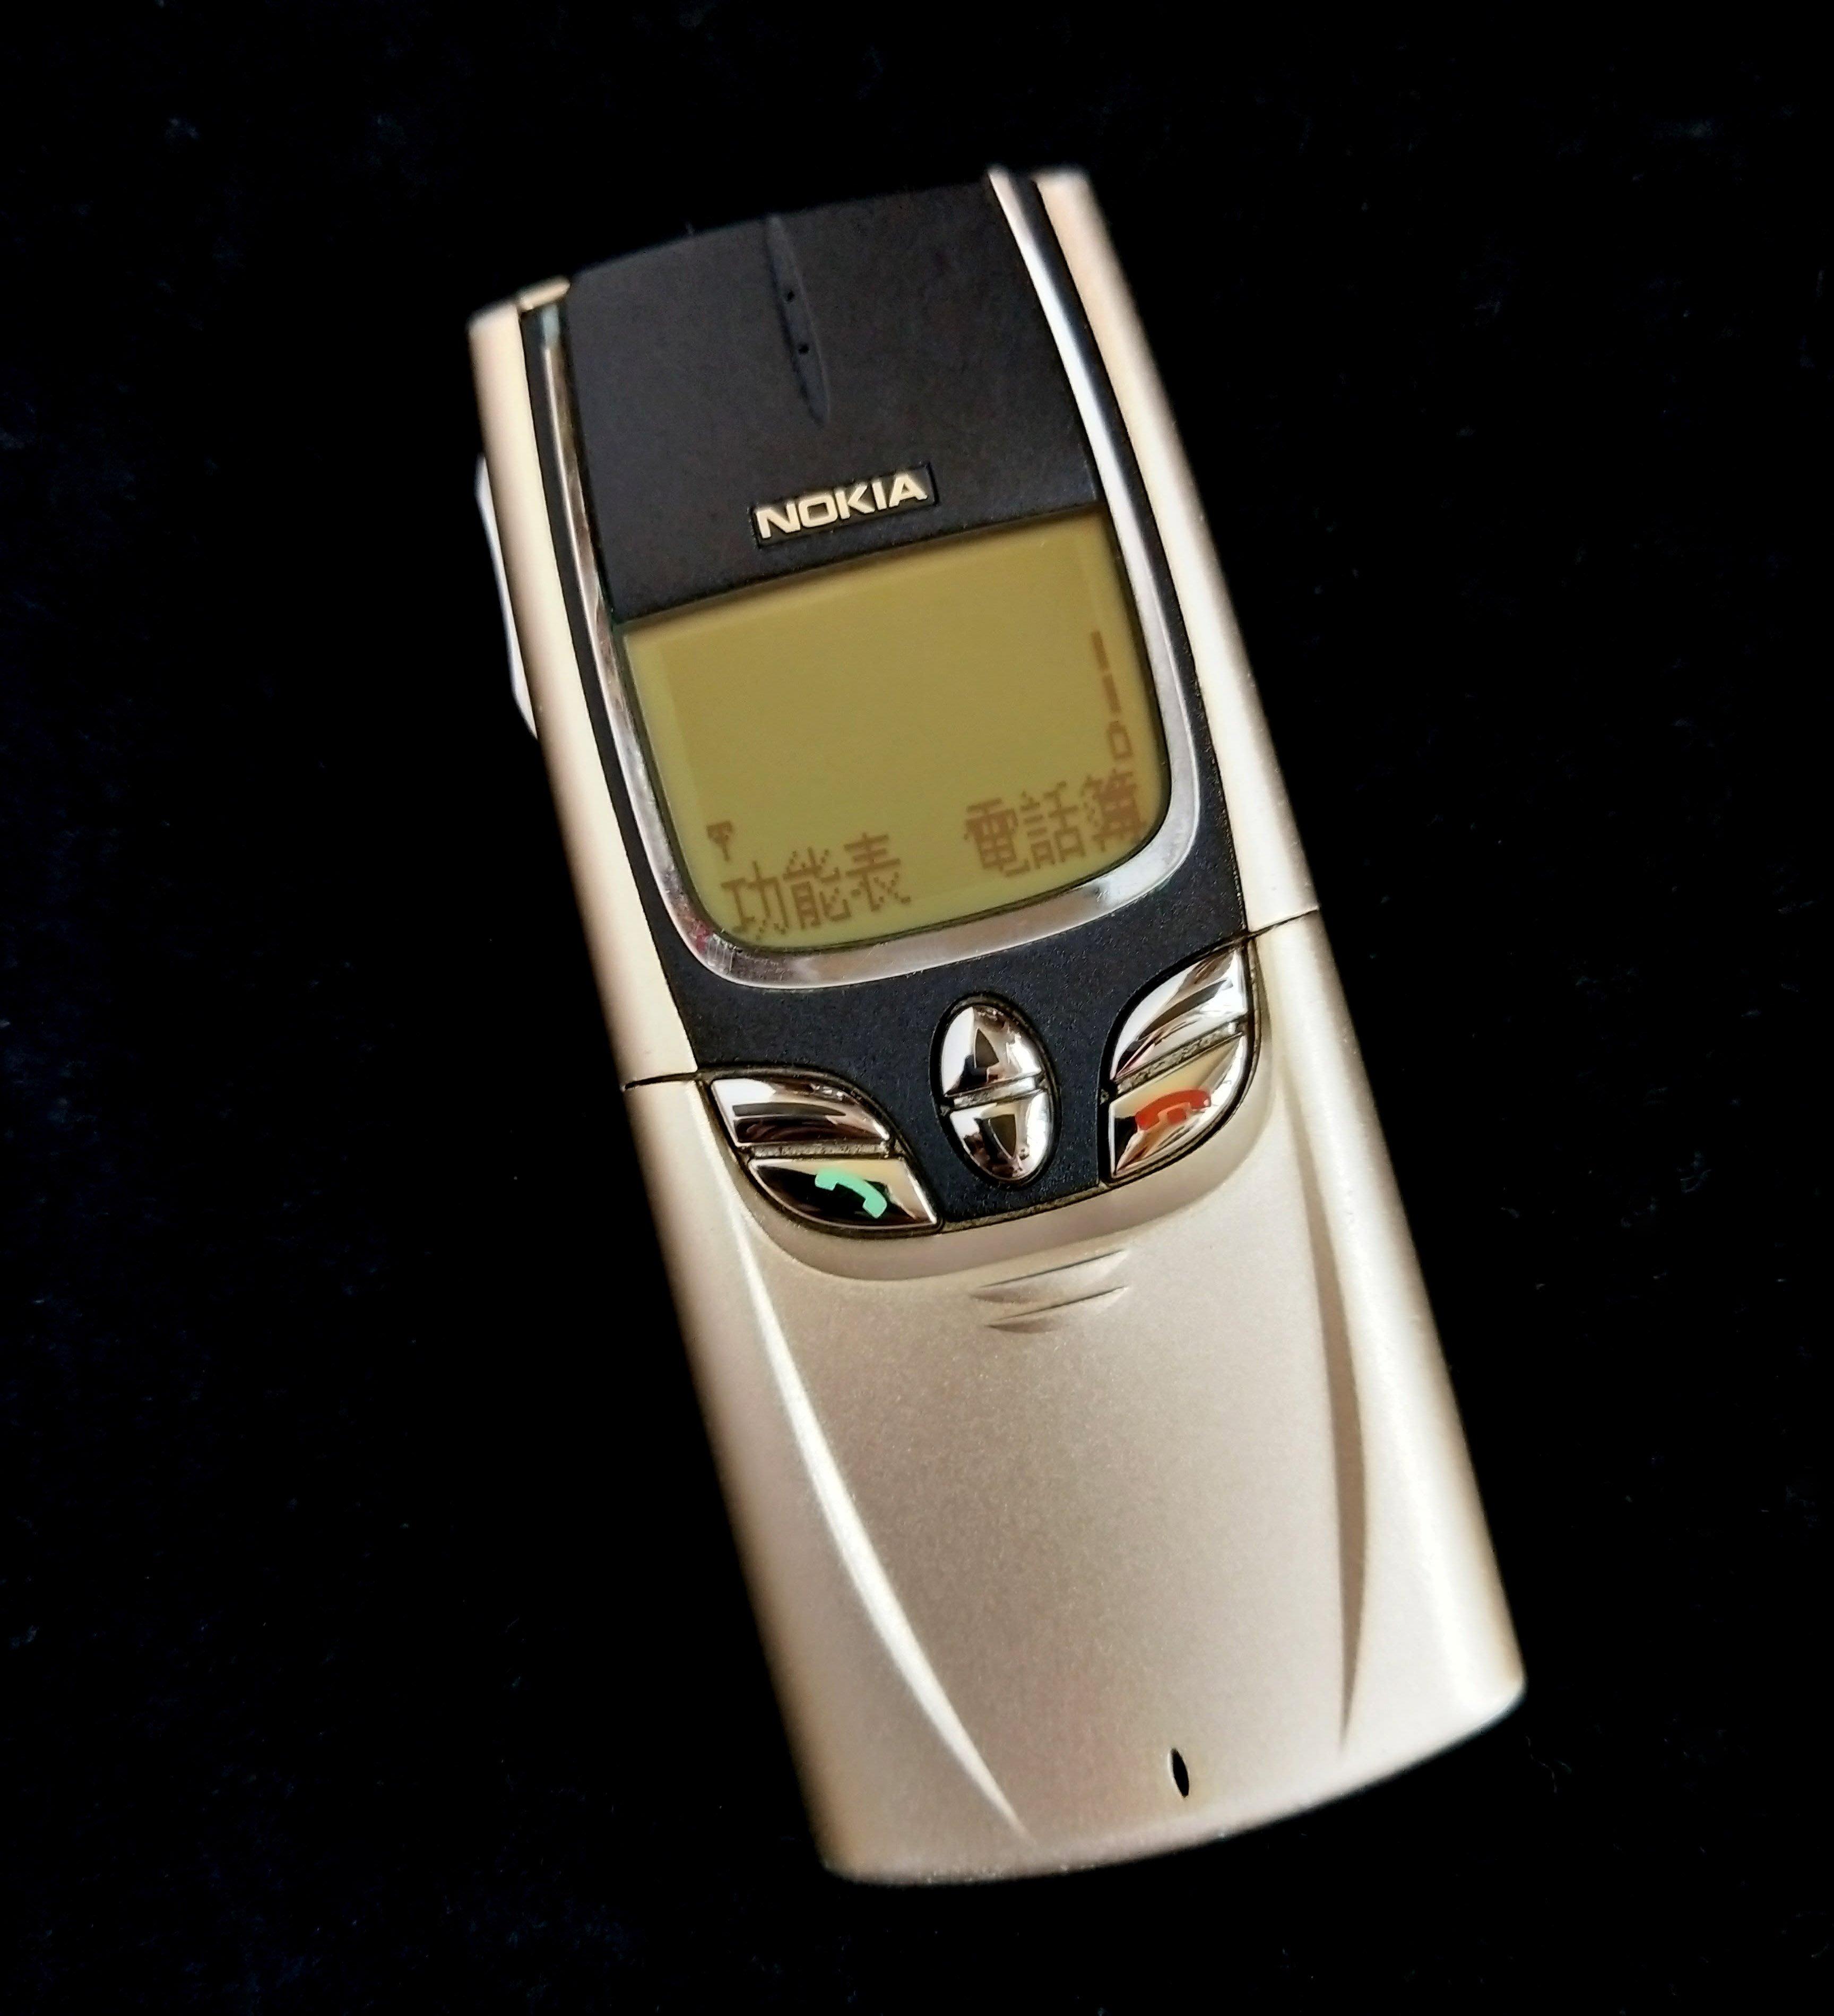 【Nokia手機】 Nokia 8850 (一手機) (非iphone)